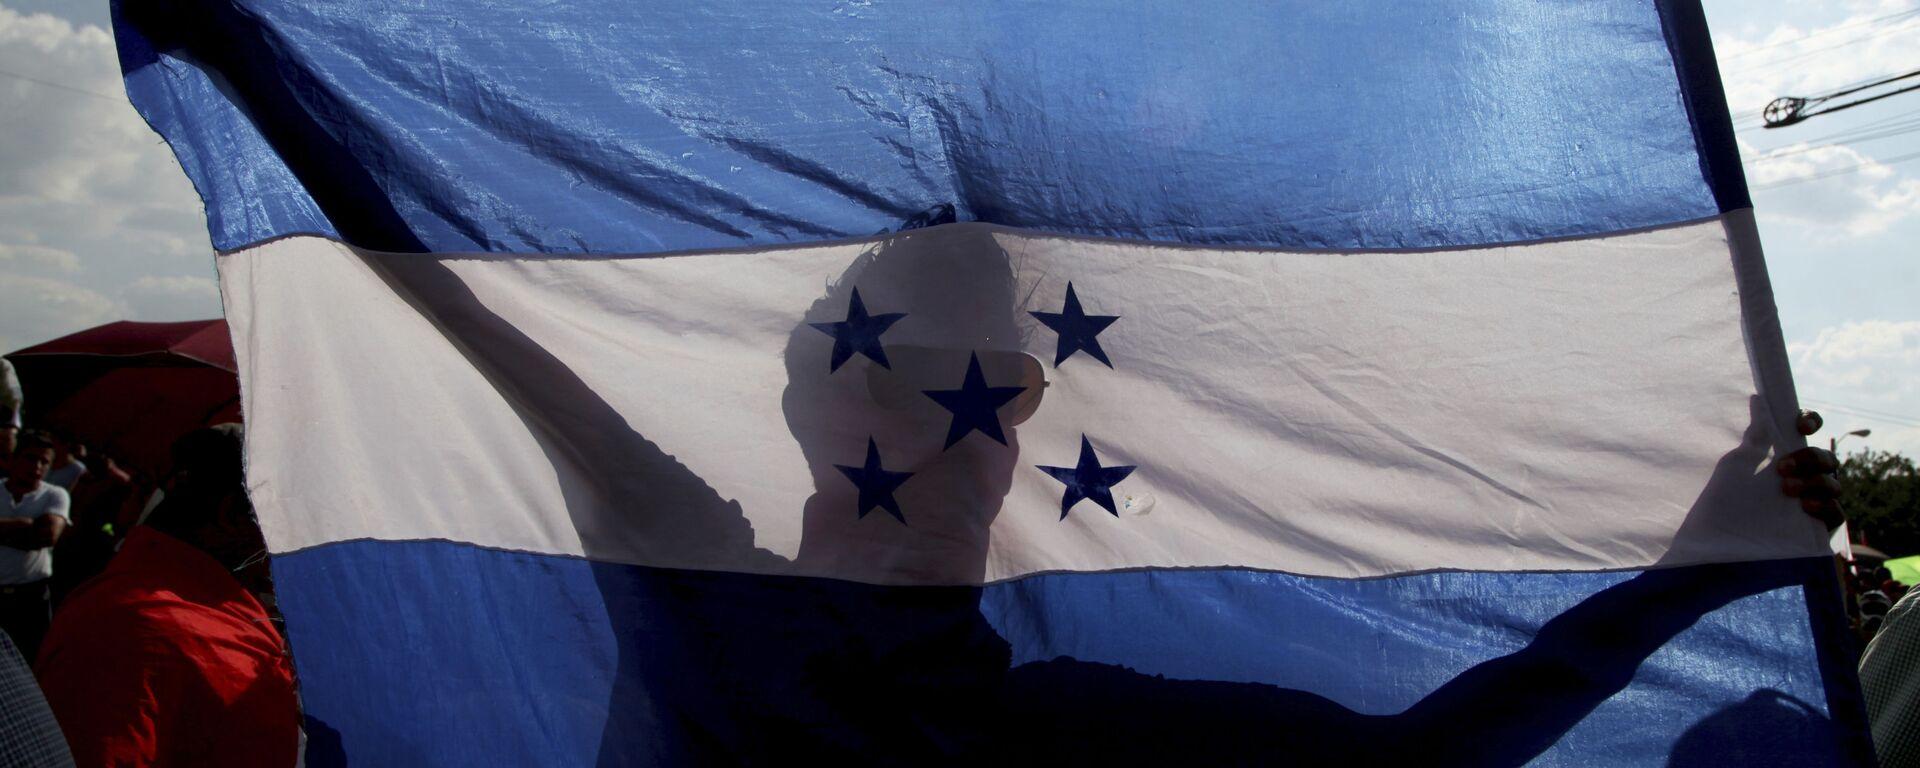 Bandera de Honduras - Sputnik Mundo, 1920, 21.07.2021